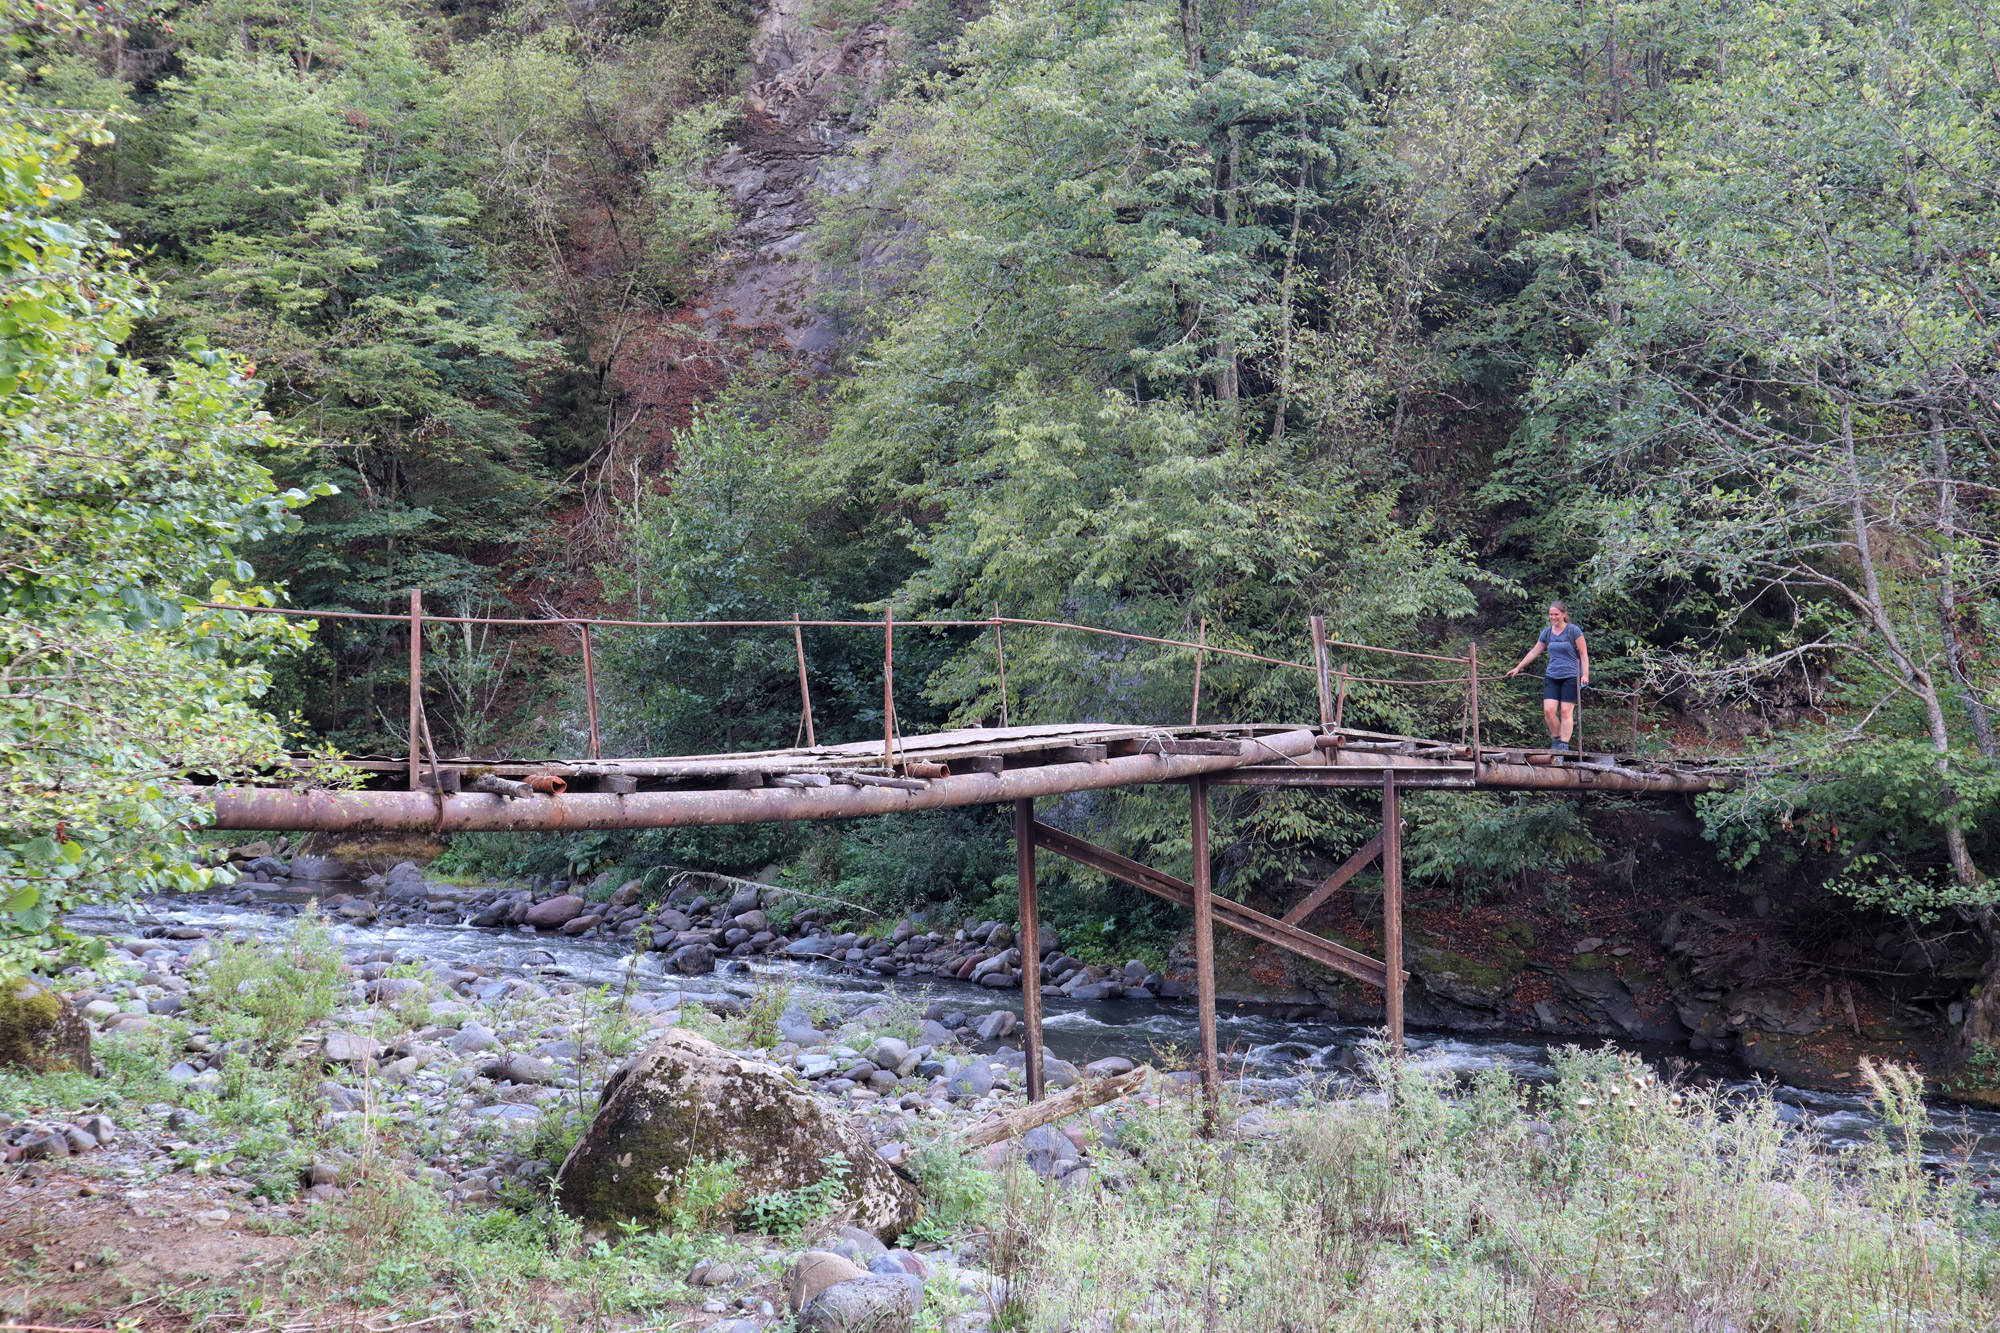 Georgie Reisverslag - Advanture Trail in Borjomi National Park